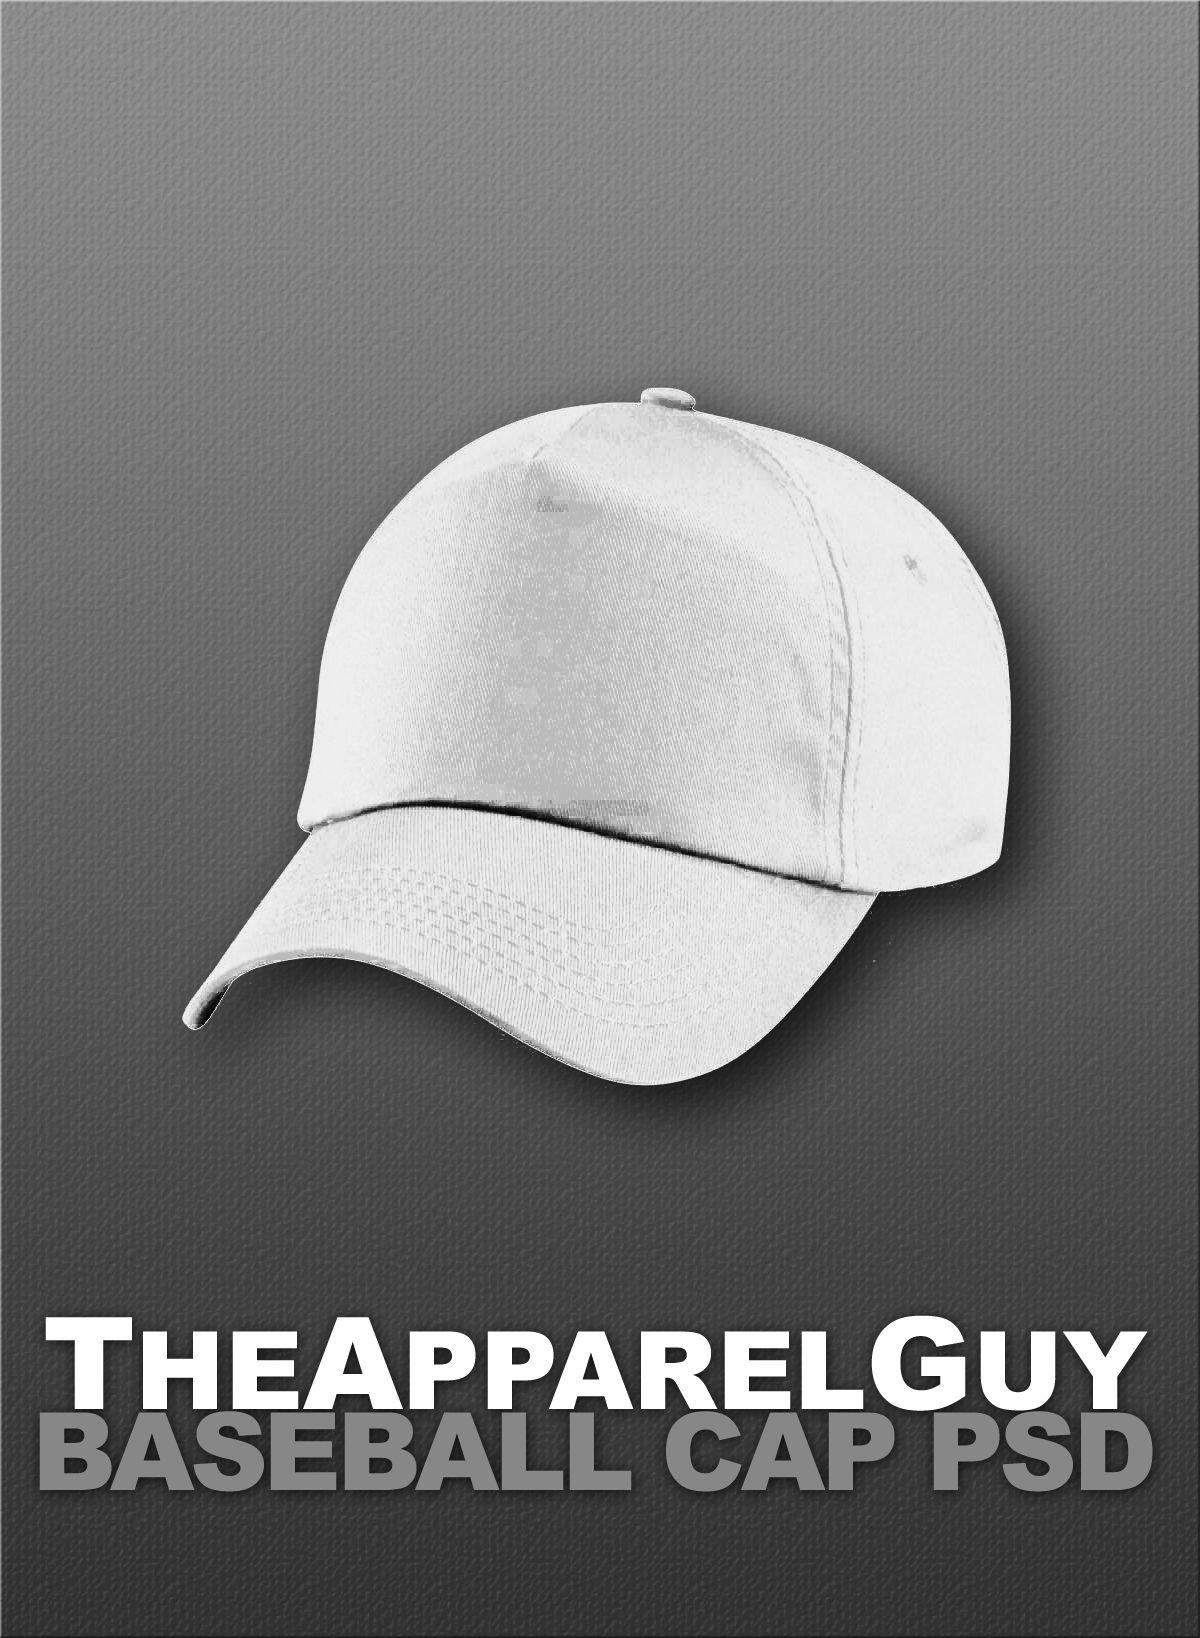 Download Baseball Cap Psd By Theapparelguy Deviantart Com On Deviantart Topi